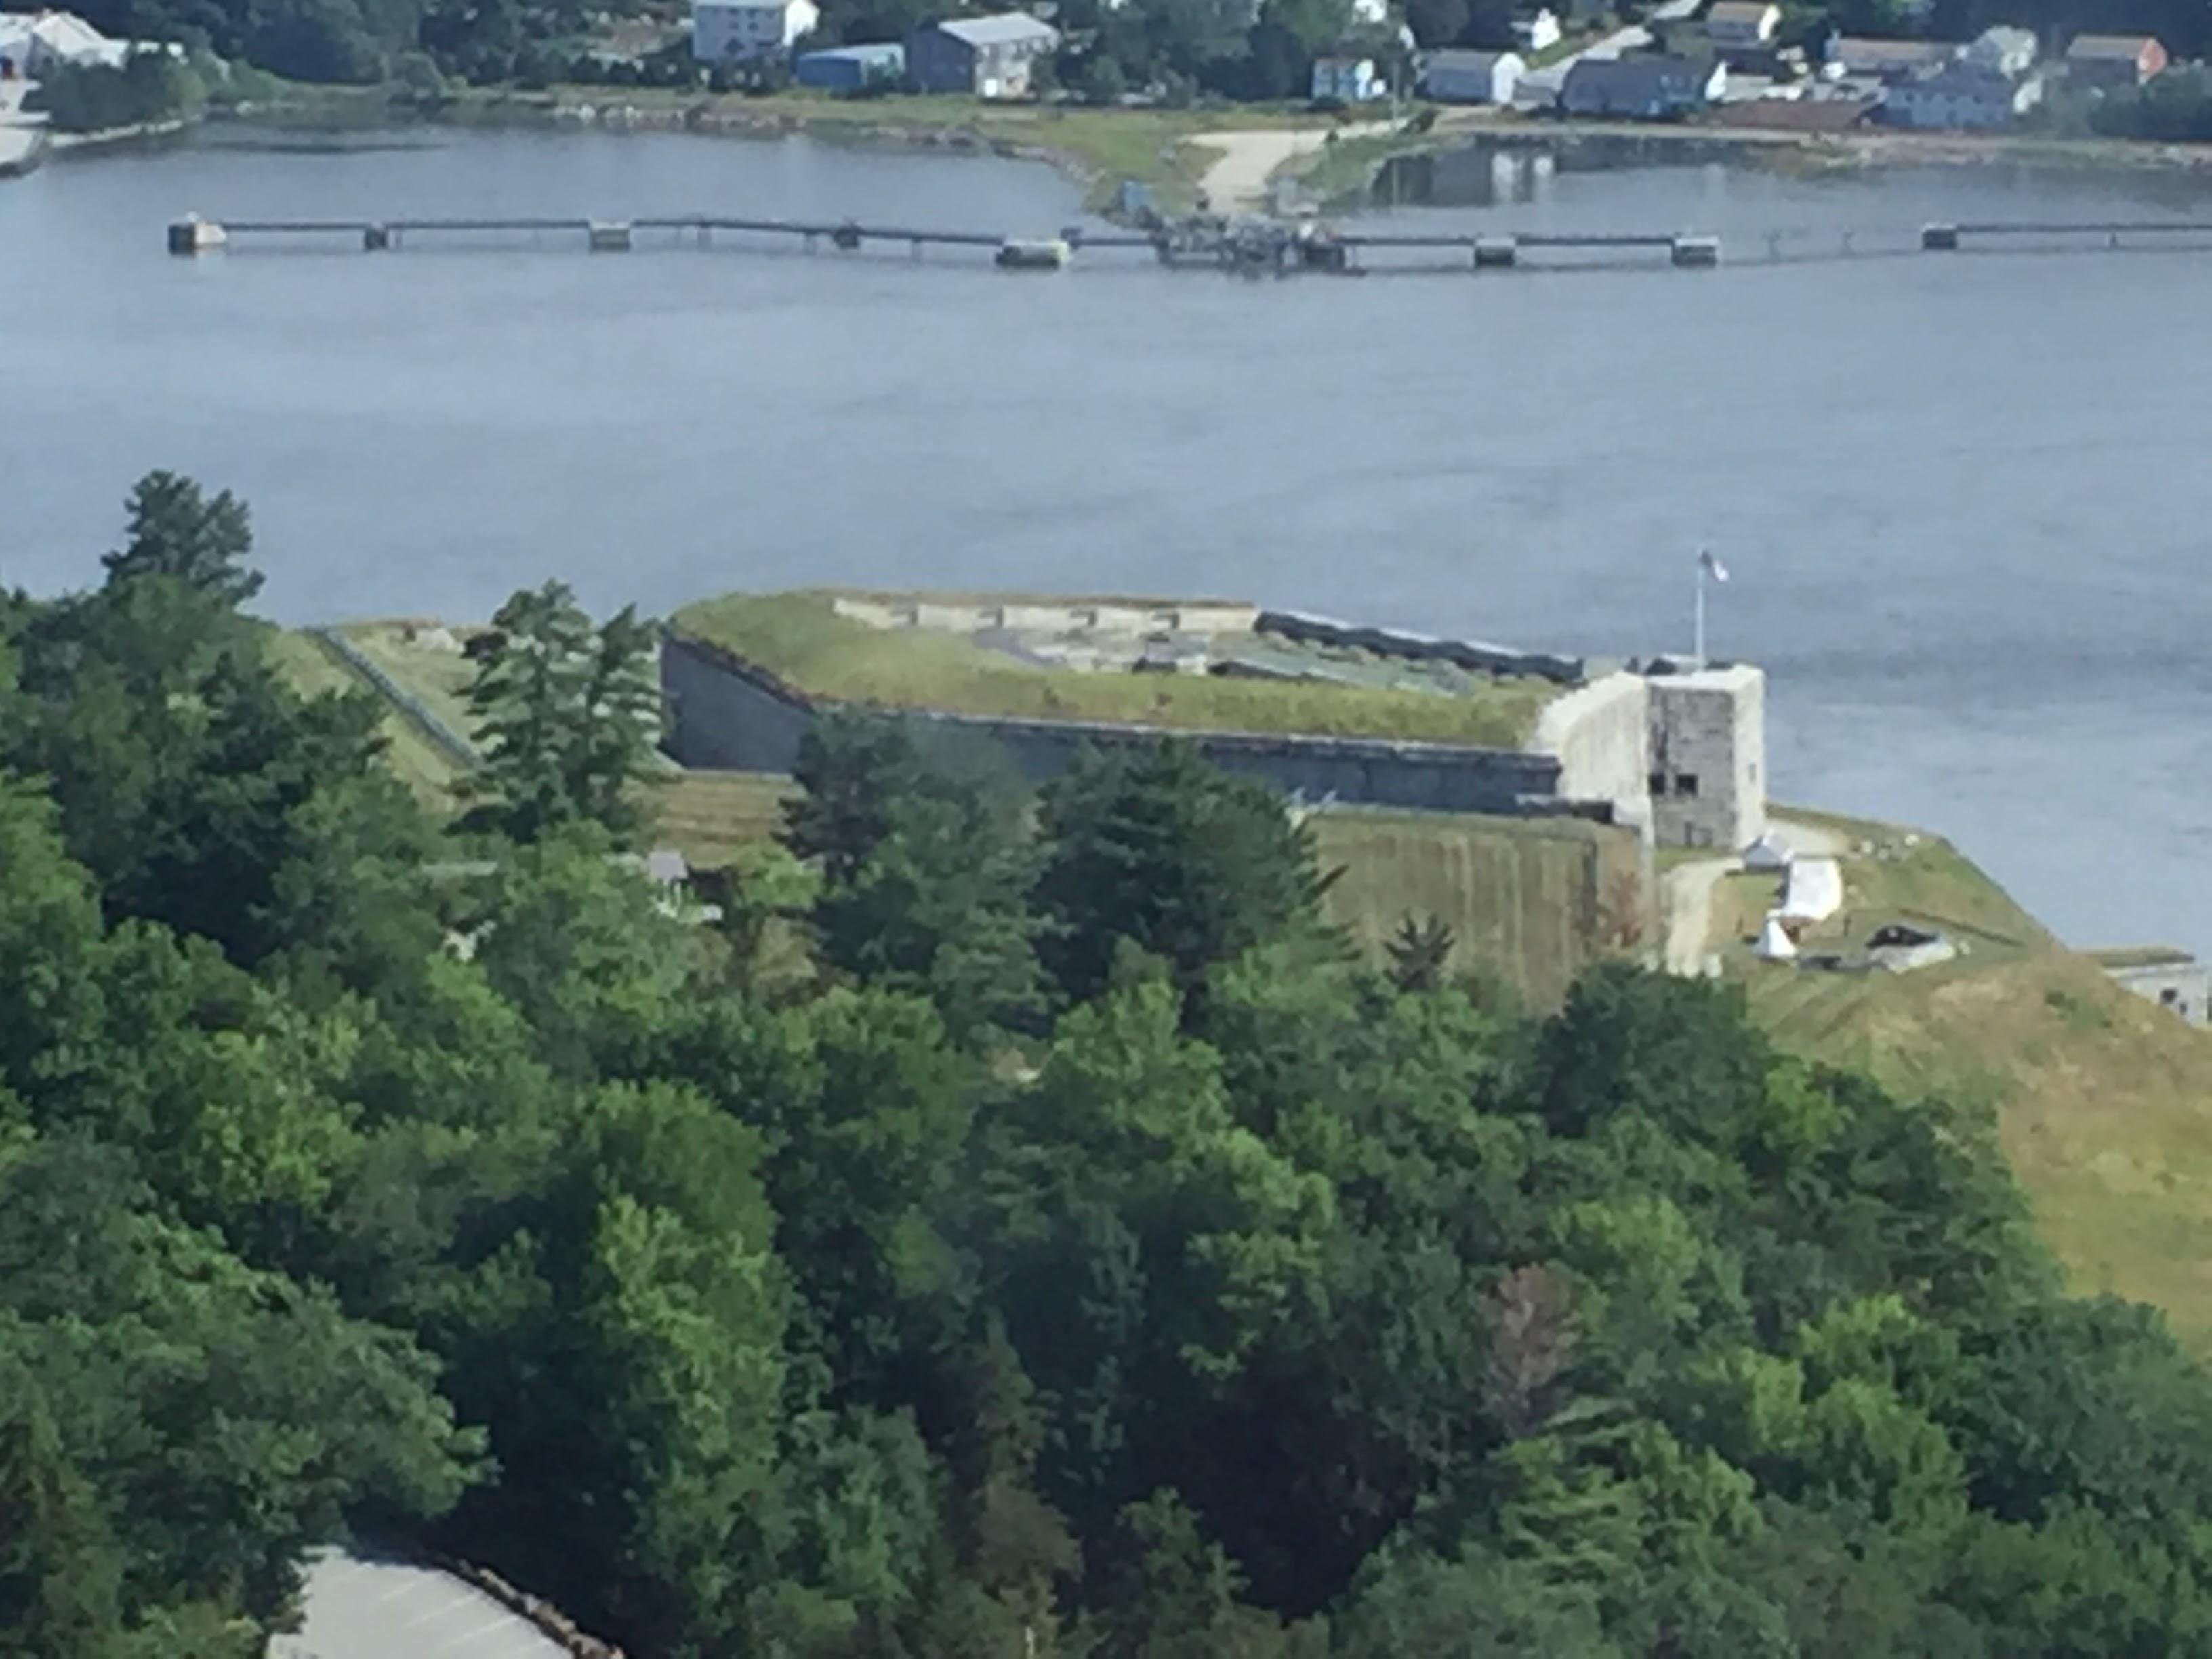 2017-07-22 Fort Knox 02